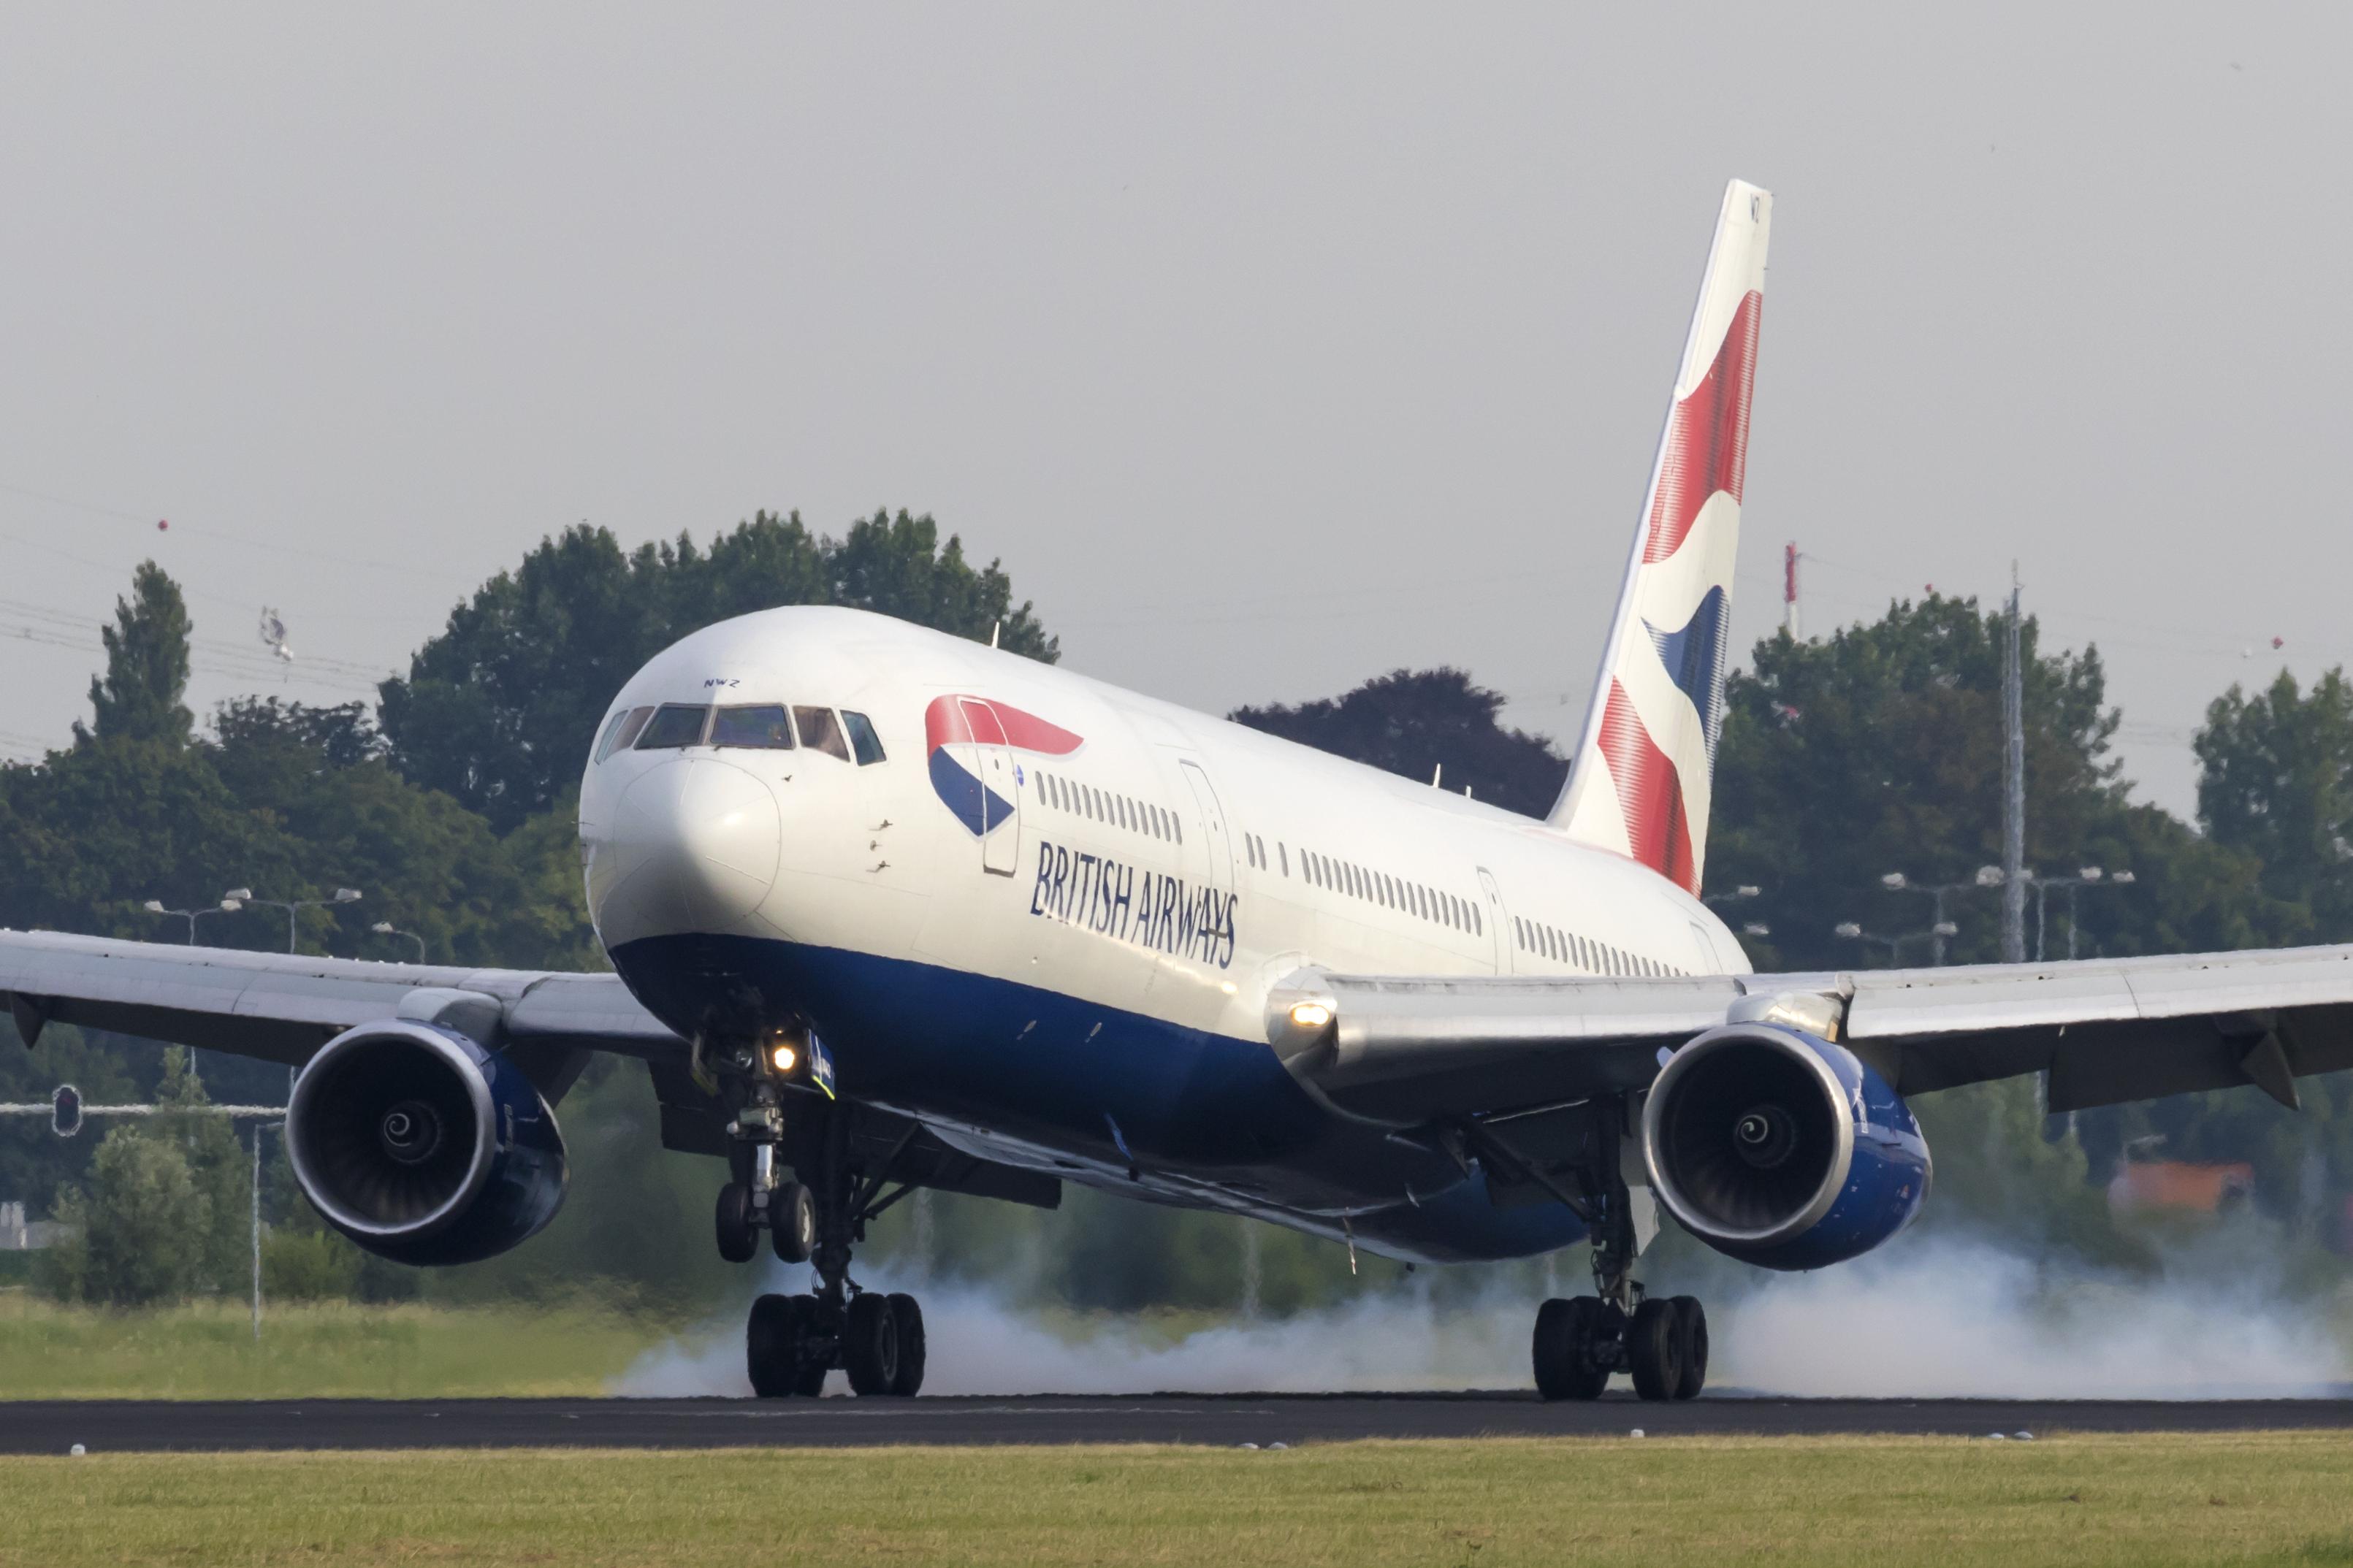 En Boeing 767-300ER fra British Airways. Foto: © Thorbjørn Brunander Sund, danishaviationphoto.com